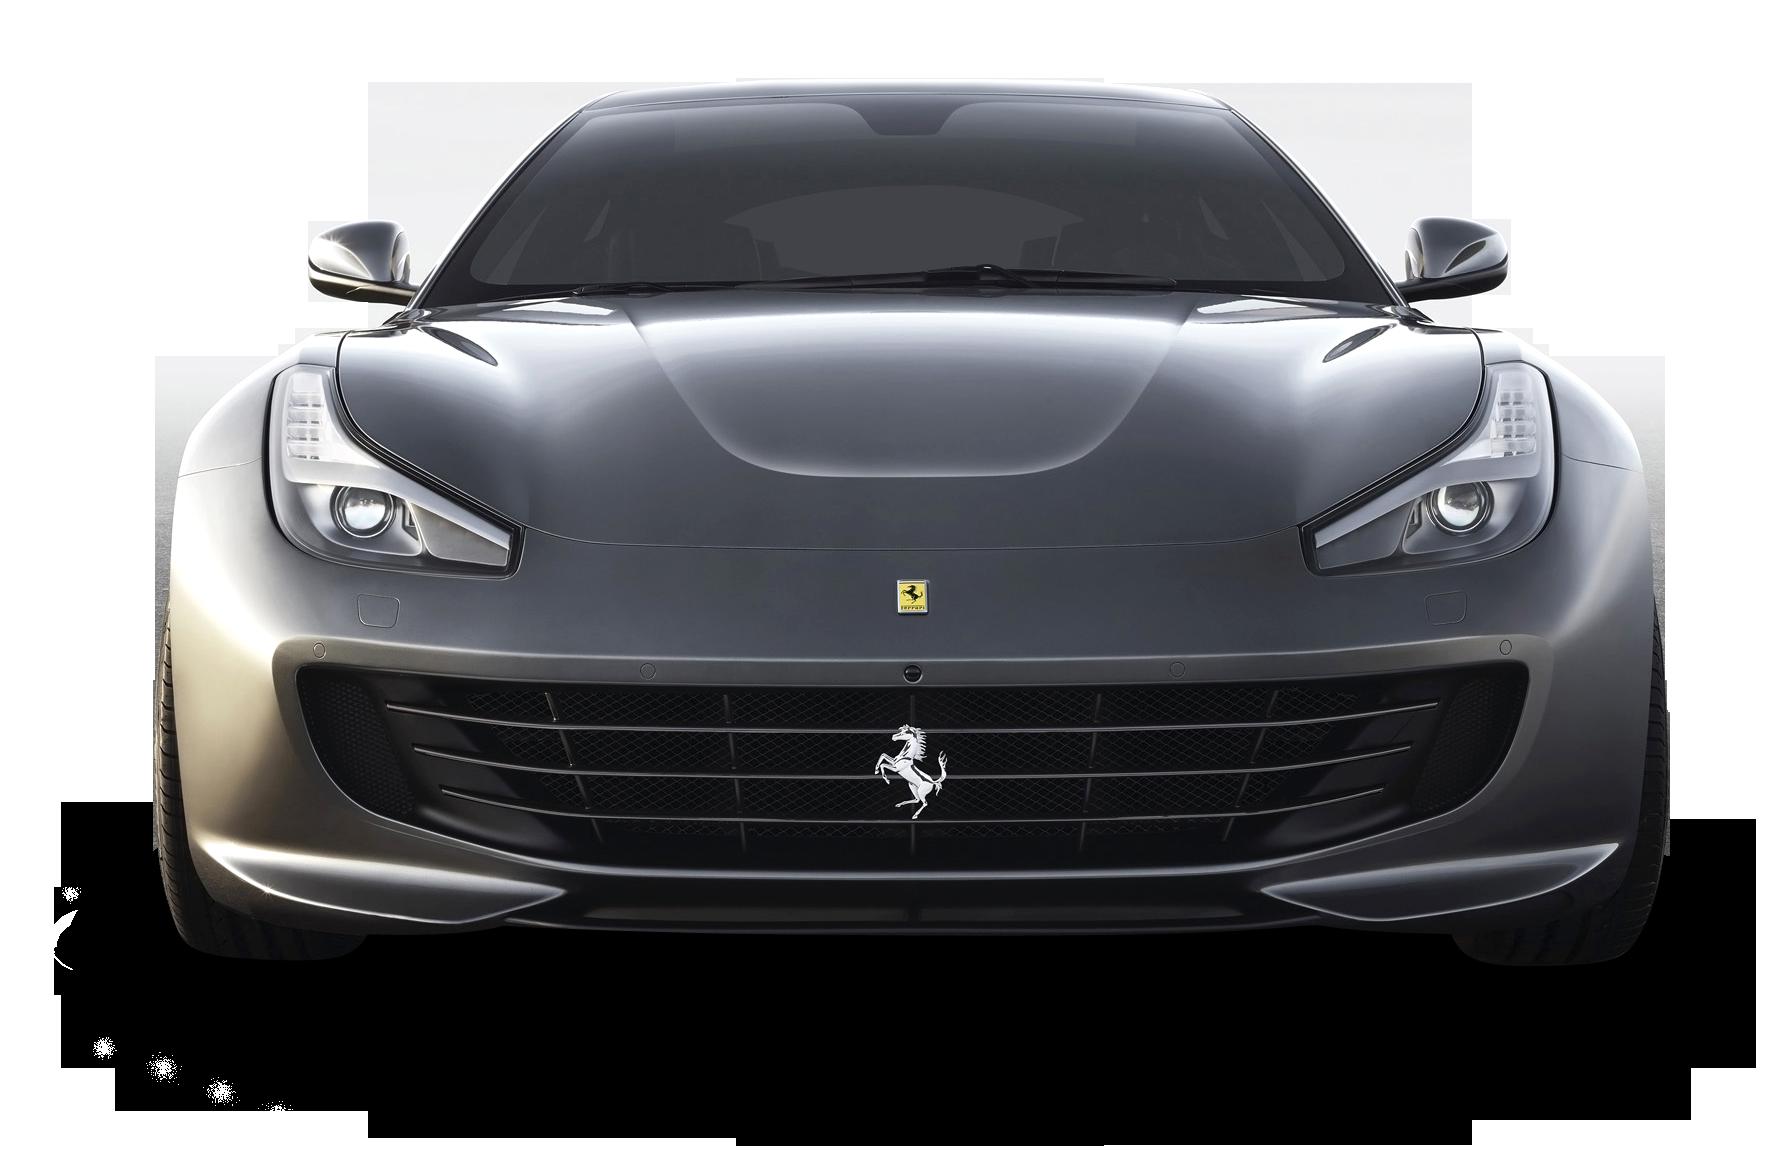 Ferrari Gtc4 Lusso Front Gray Car Png Image Grey Car Car Blue Car Accessories